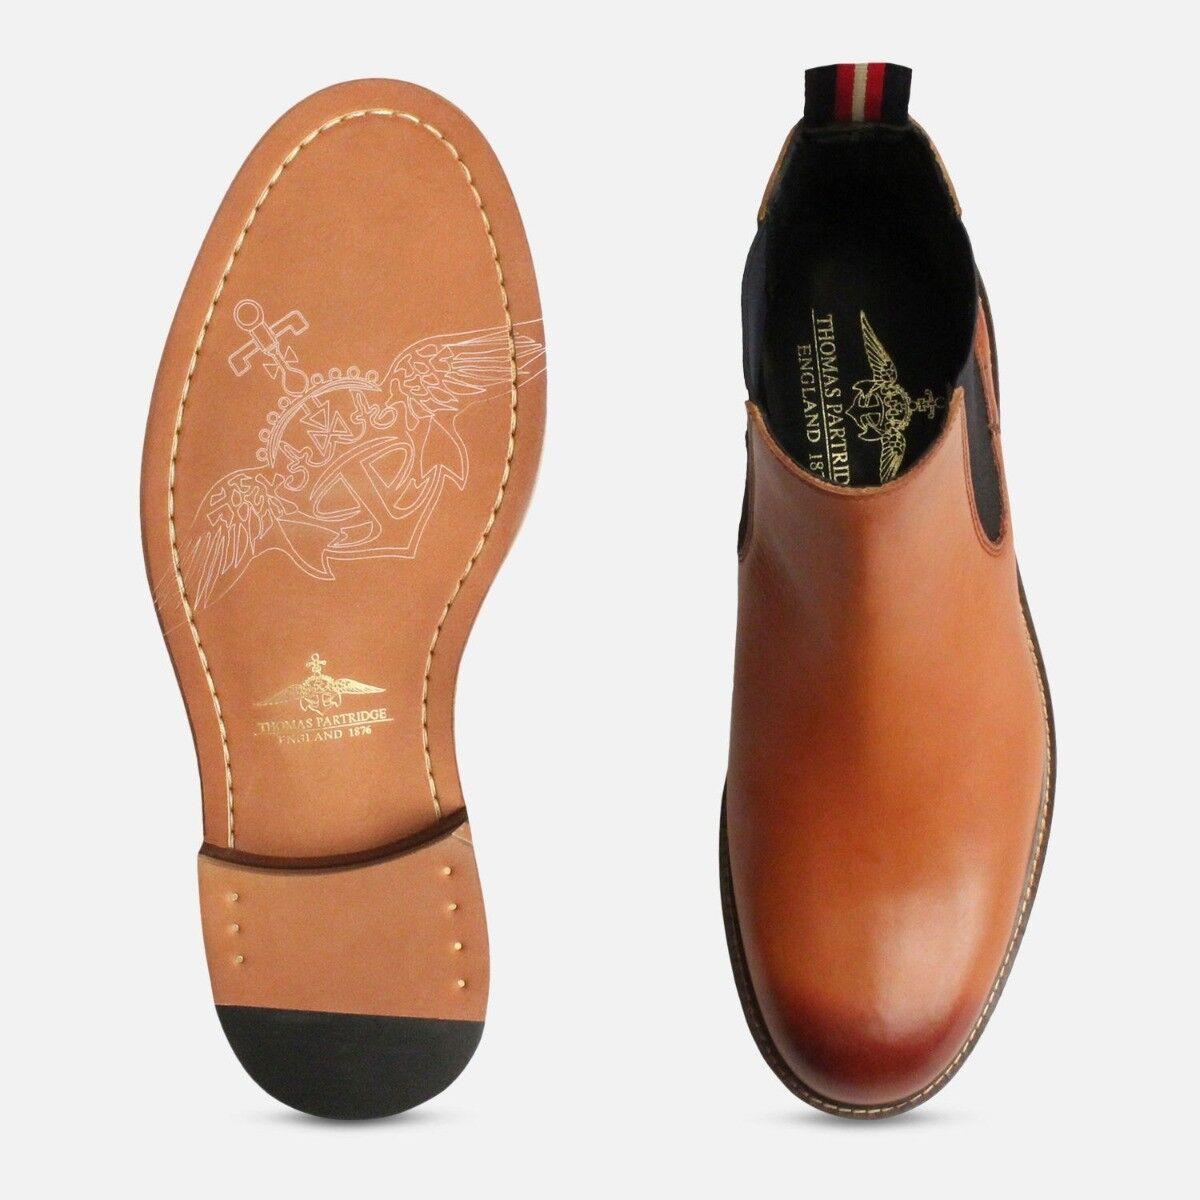 Thomas Thomas Thomas Partridge London Tan Cranwell Chelsea Stiefel df6418